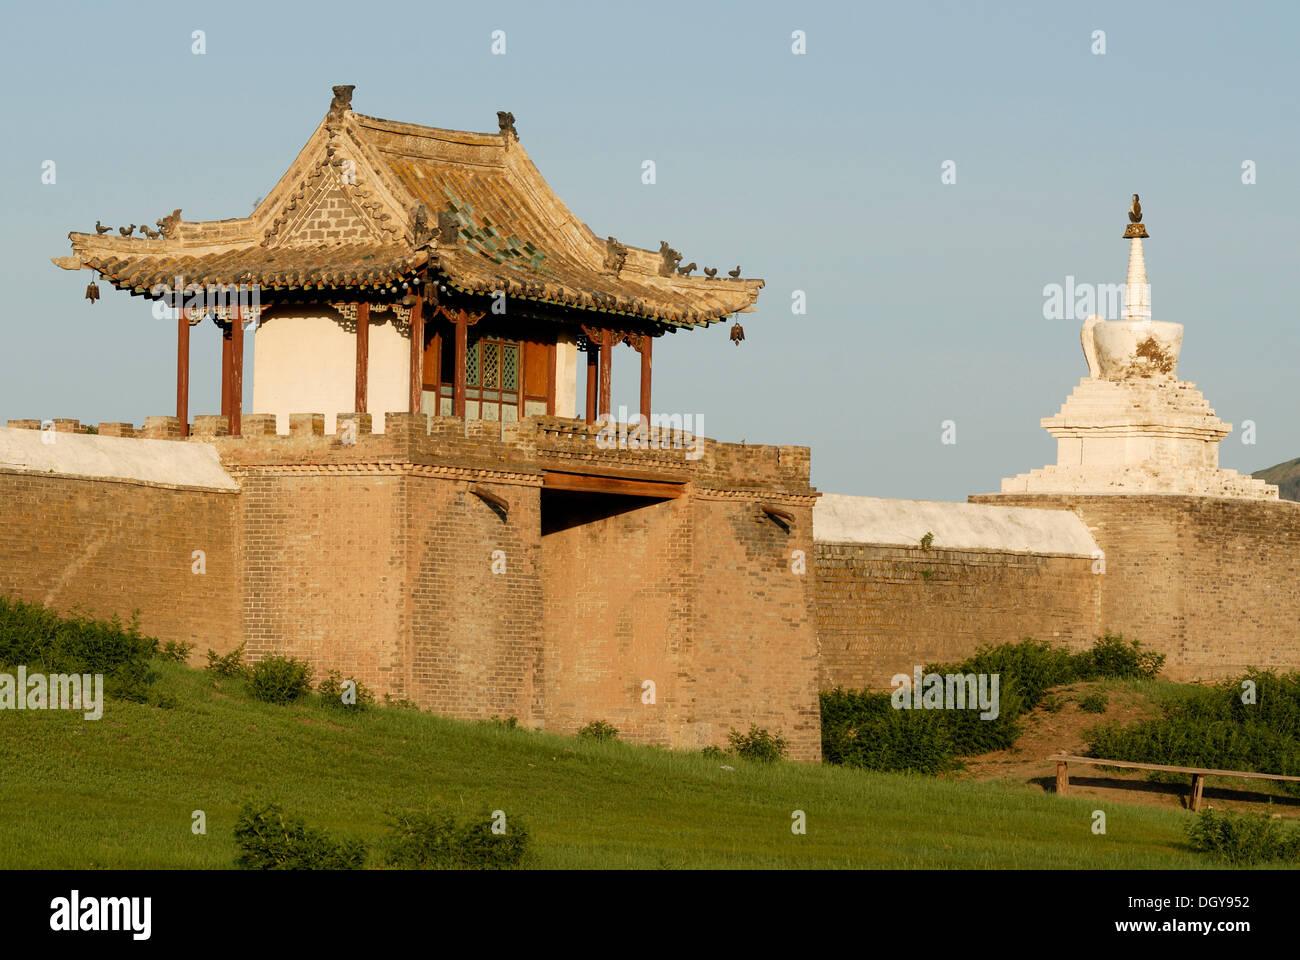 Stupa and gatehouse of the outer wall of Erdene Zuu Khiid Monastery, Karakorum, Kharkhorin, Oevoerkhangai Aimak, Mongolia, Asia - Stock Image